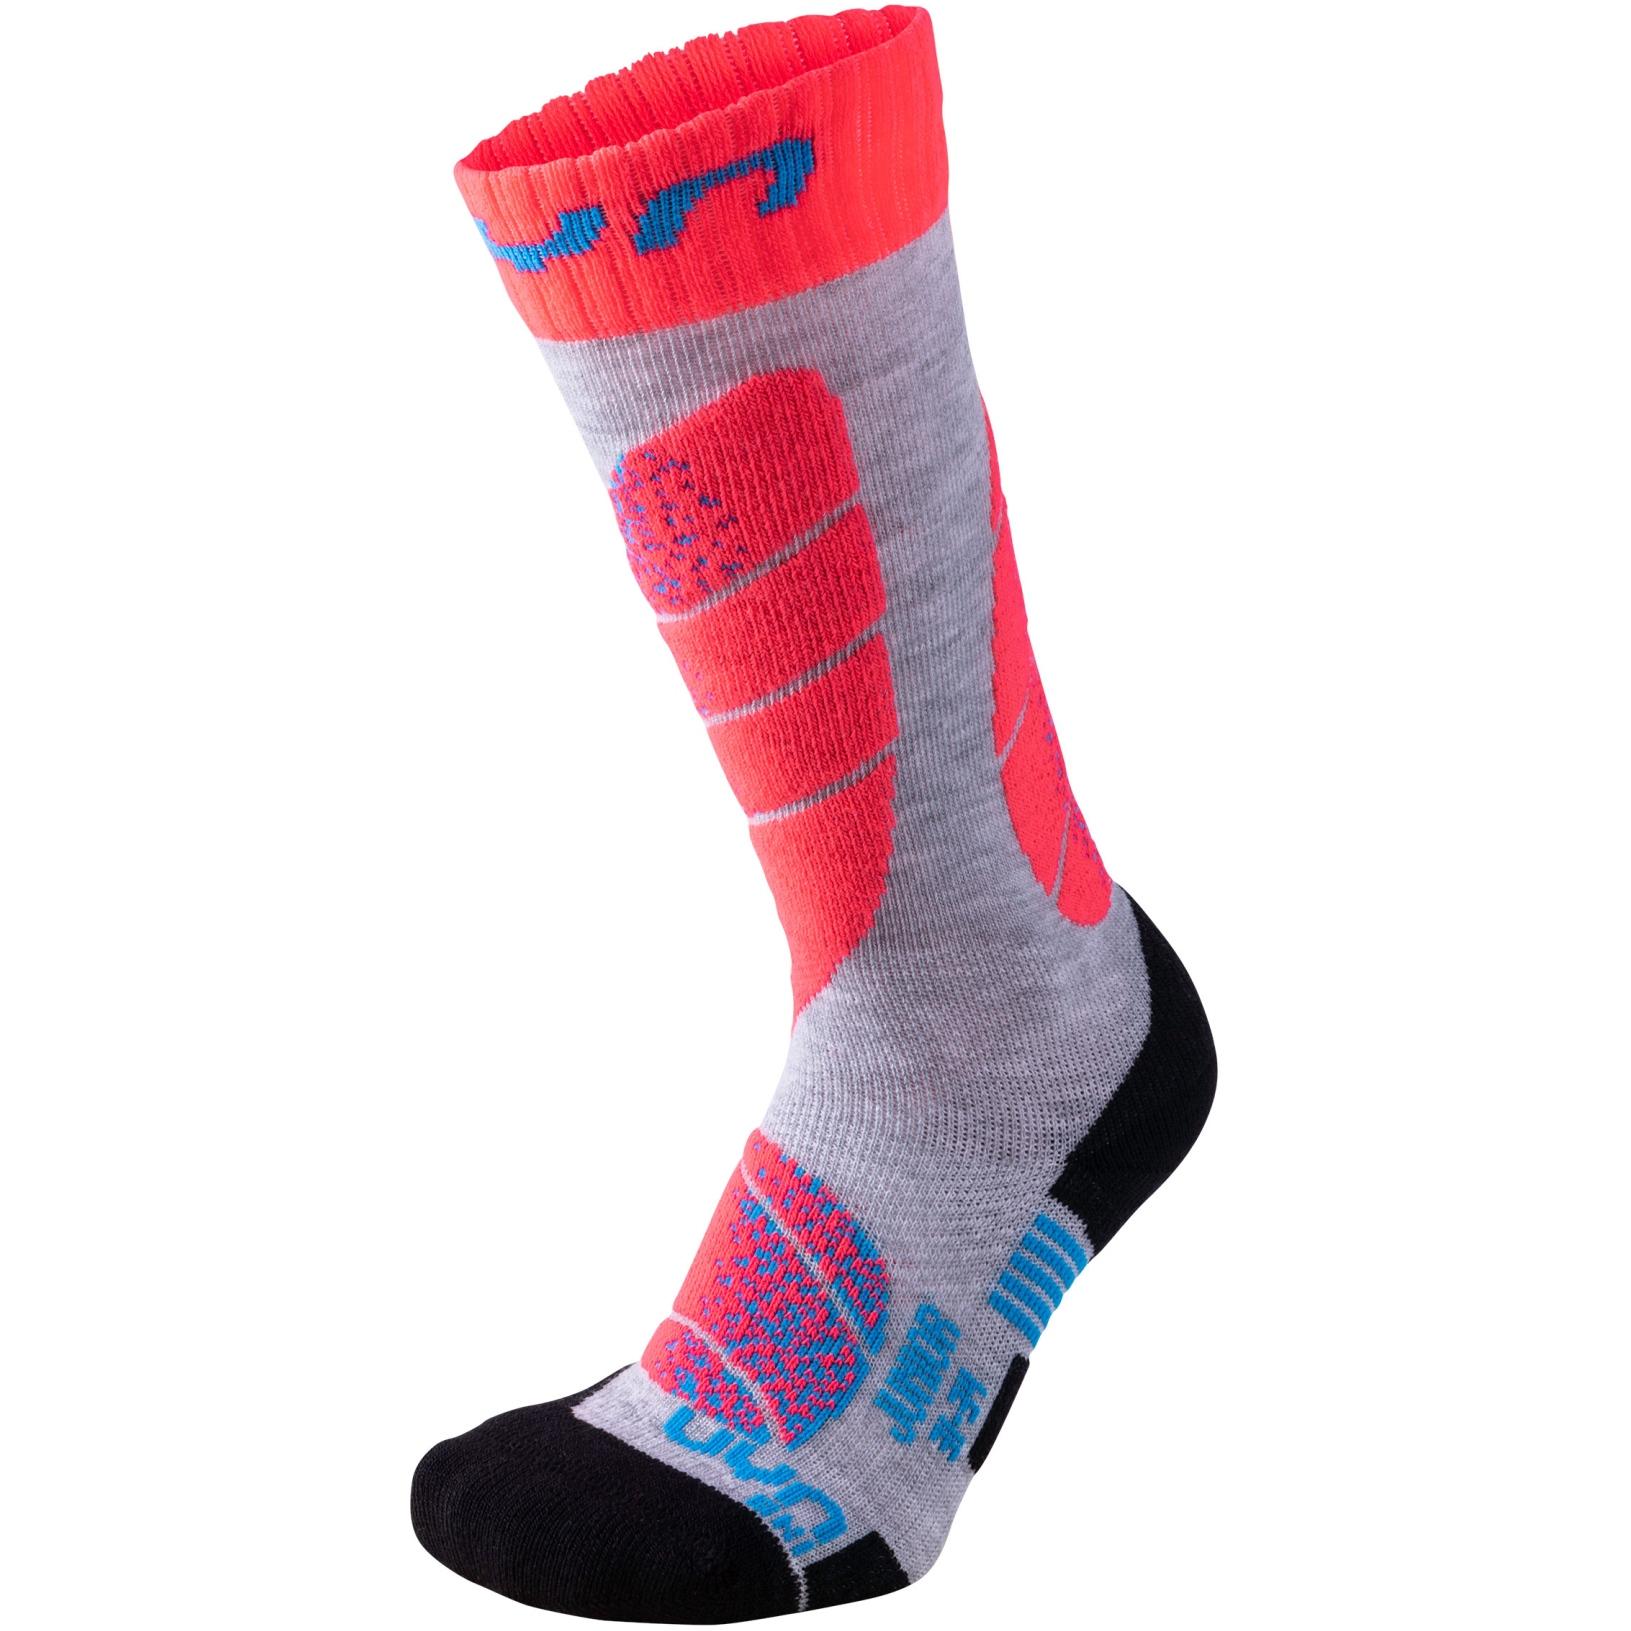 UYN Ski Junior Socks - Light Grey/Coral Fluo